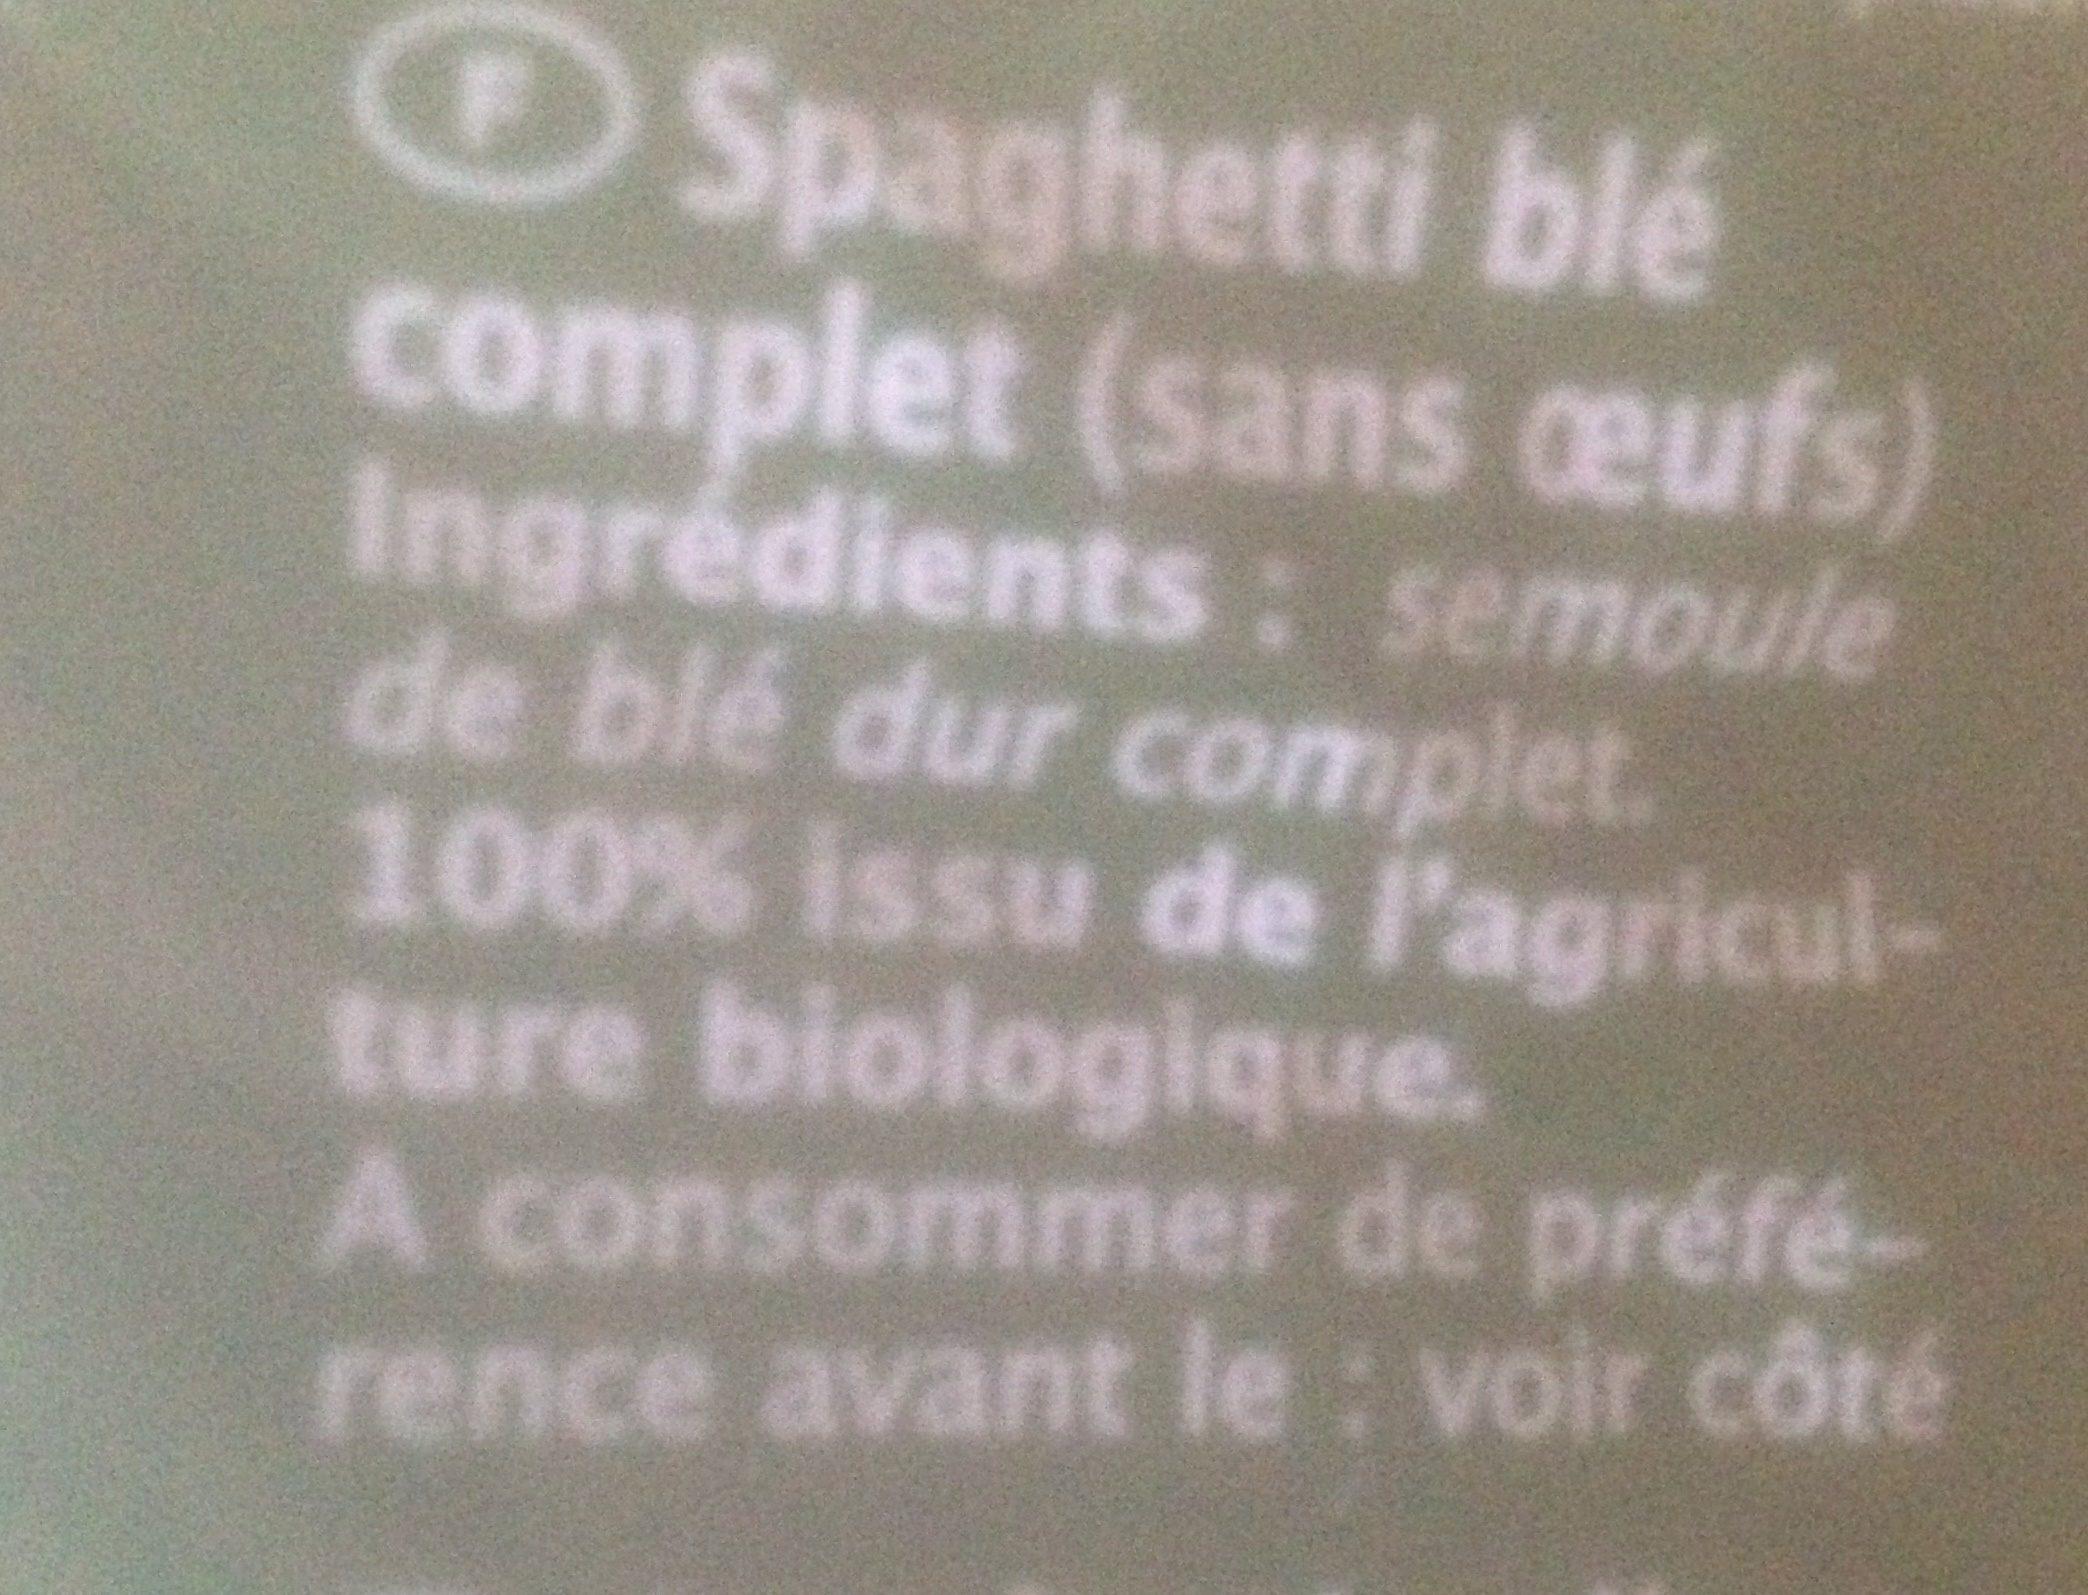 Spaghetti, Vollkorn - Ingredients - fr